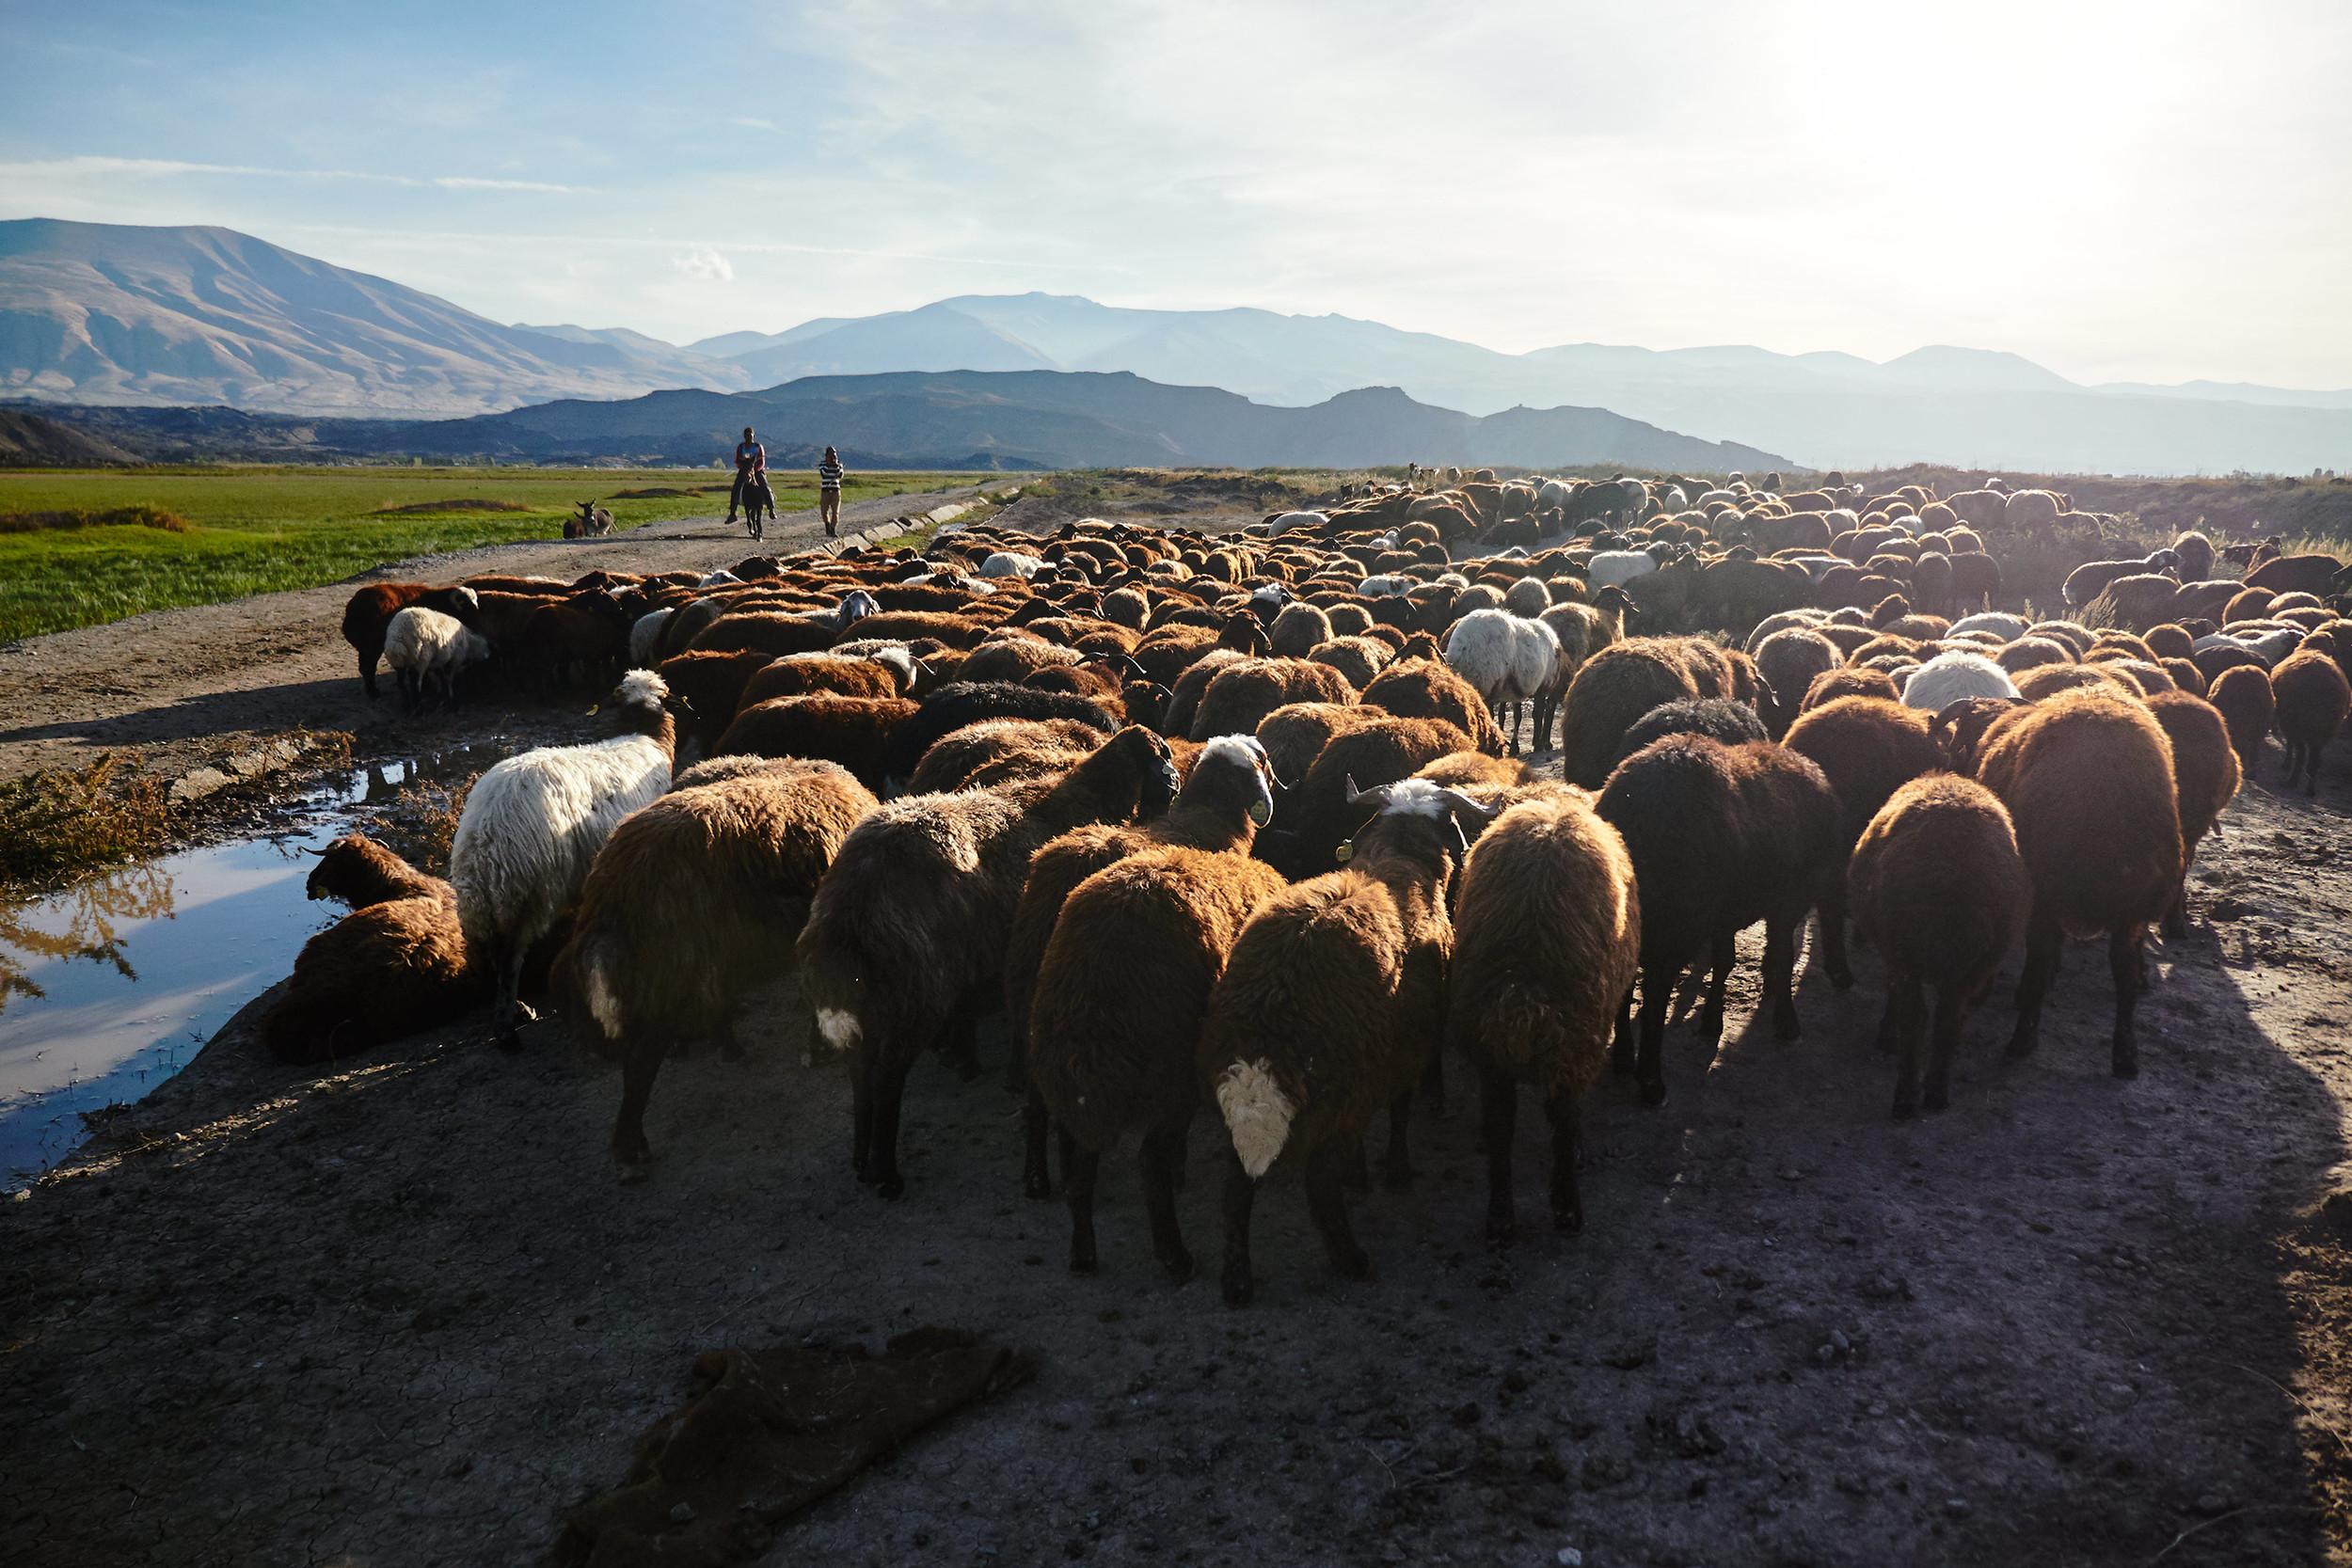 Sheep and shepheds at sunset